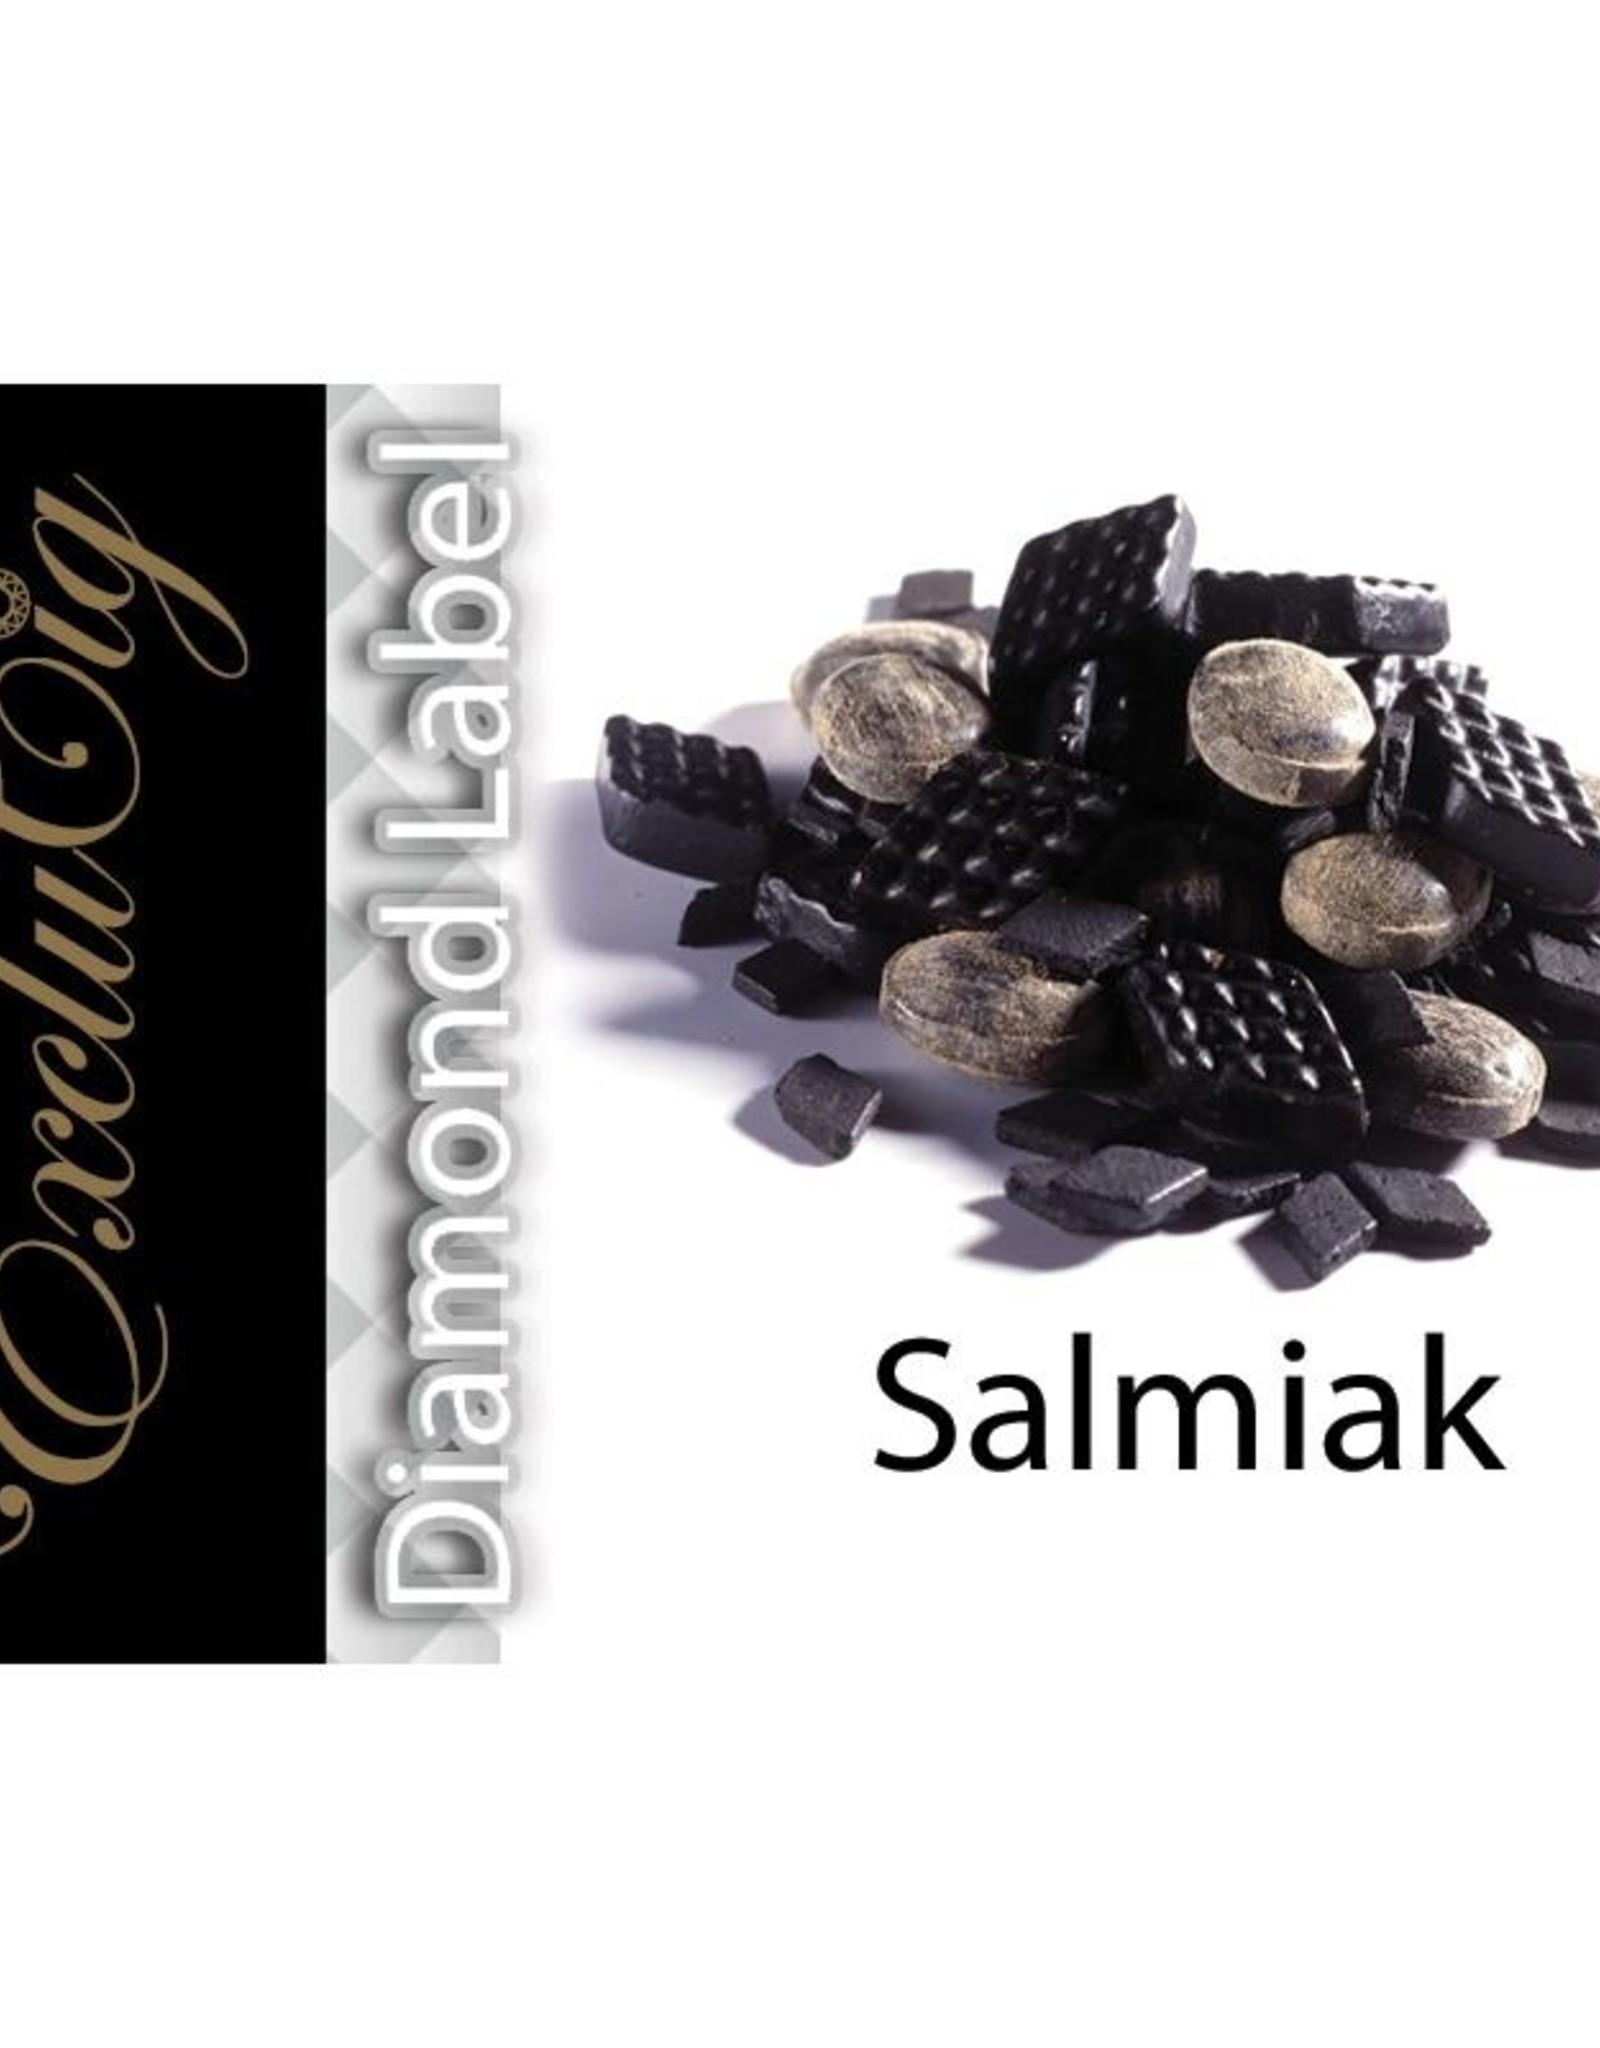 Exclucig Exclucig Diamond Label E-liquid Salmiak 18 mg Nicotine